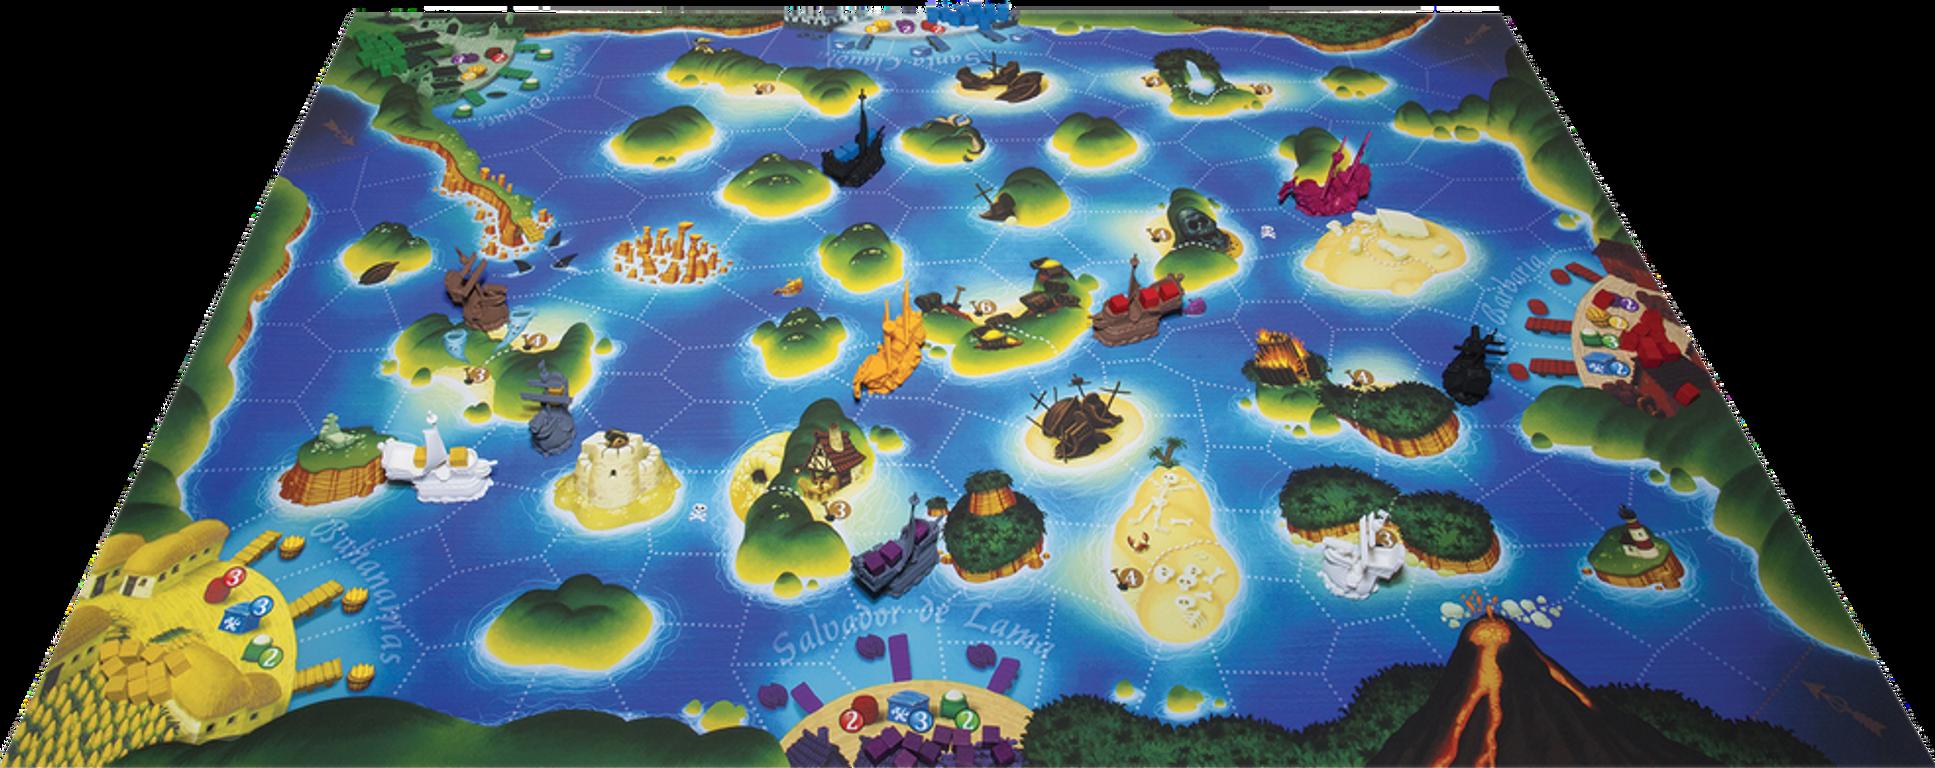 Black Fleet gameplay